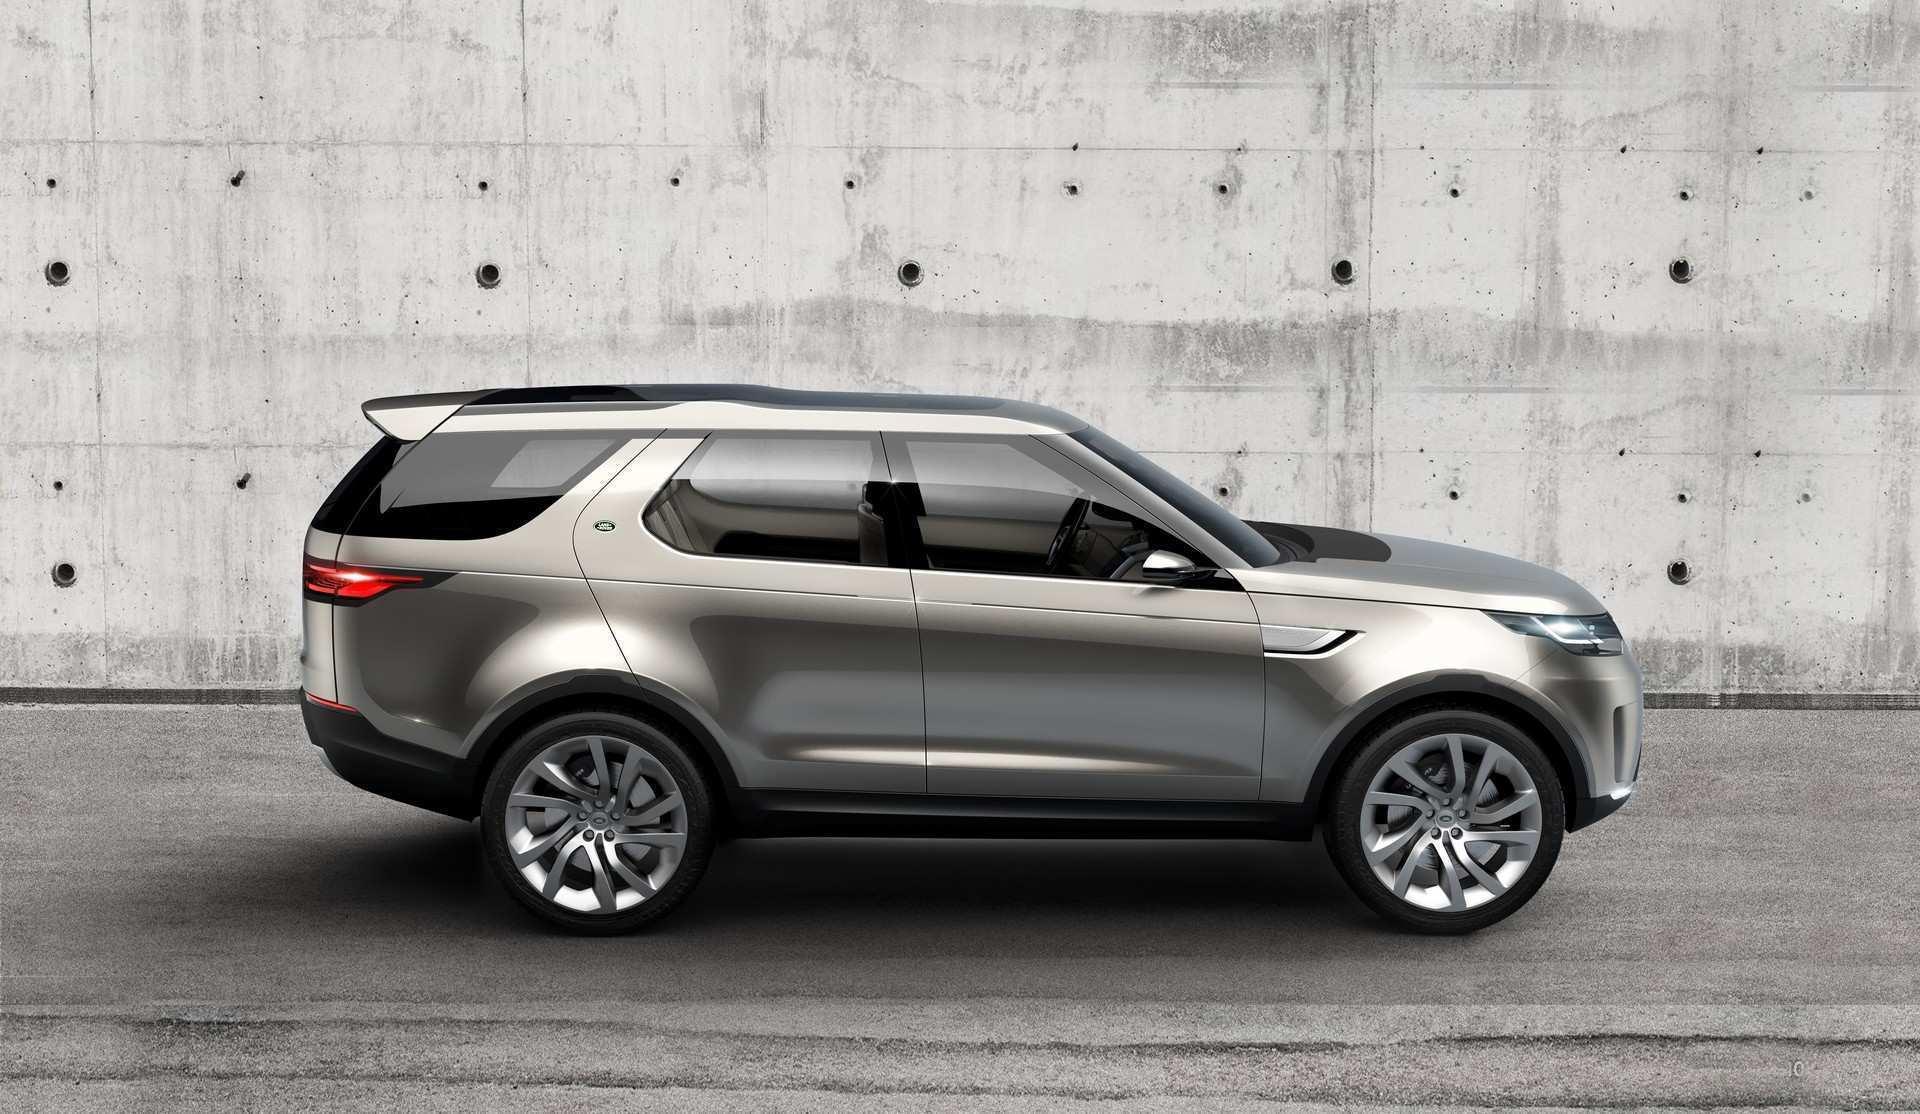 50 Gallery of Jaguar Land Rover 2020 Vision Interior for Jaguar Land Rover 2020 Vision